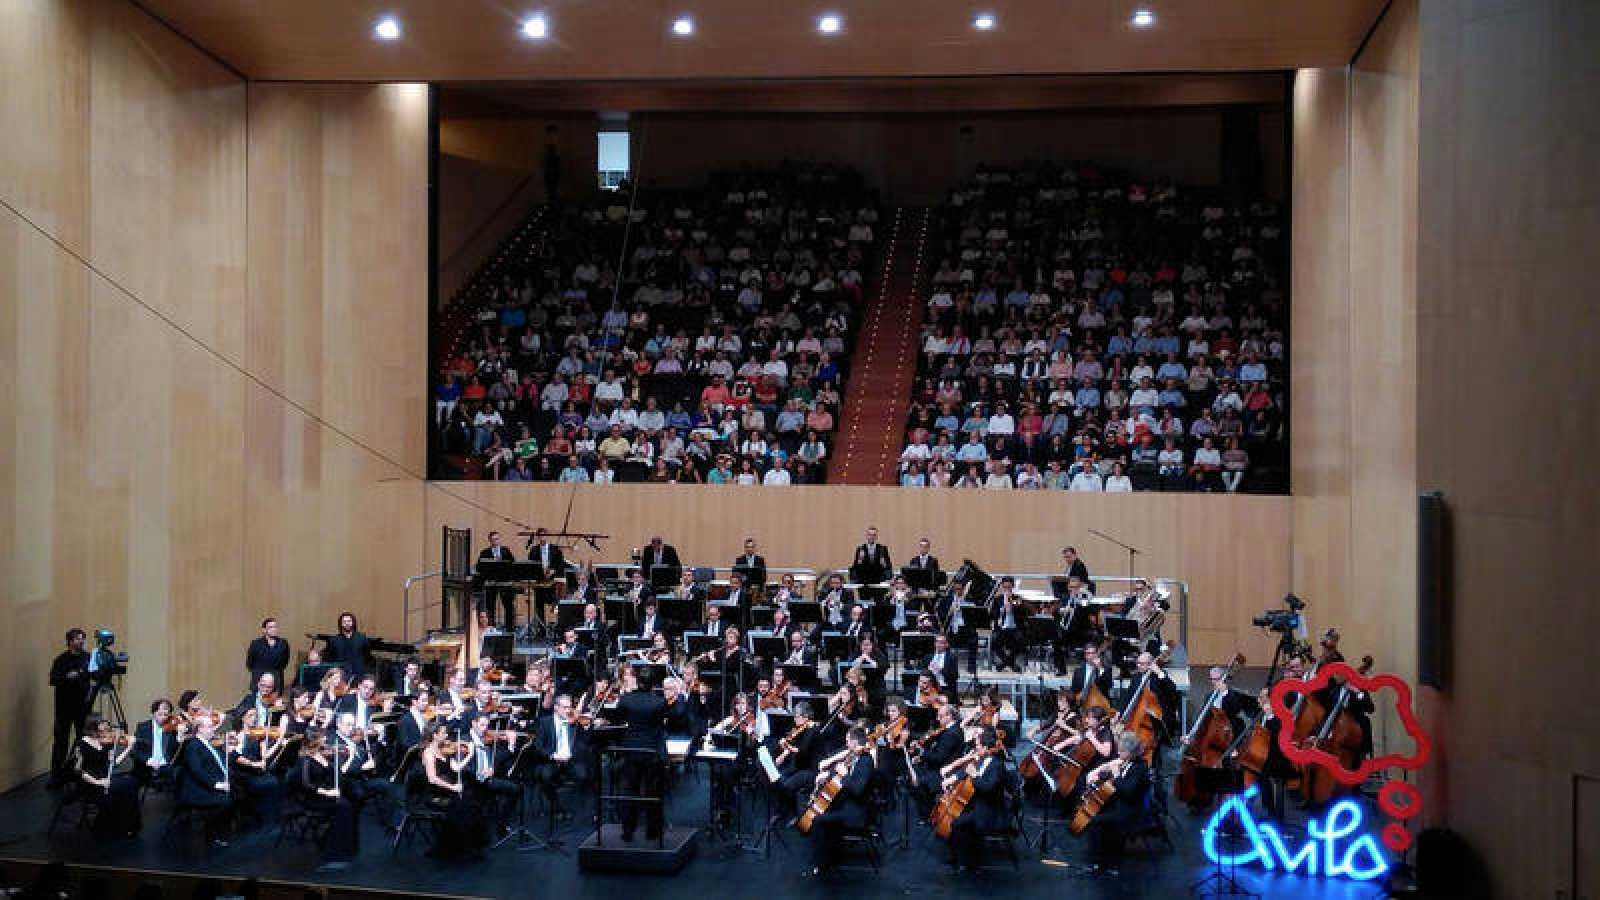 La Orquesta Sinfónica RTVE en Ávila